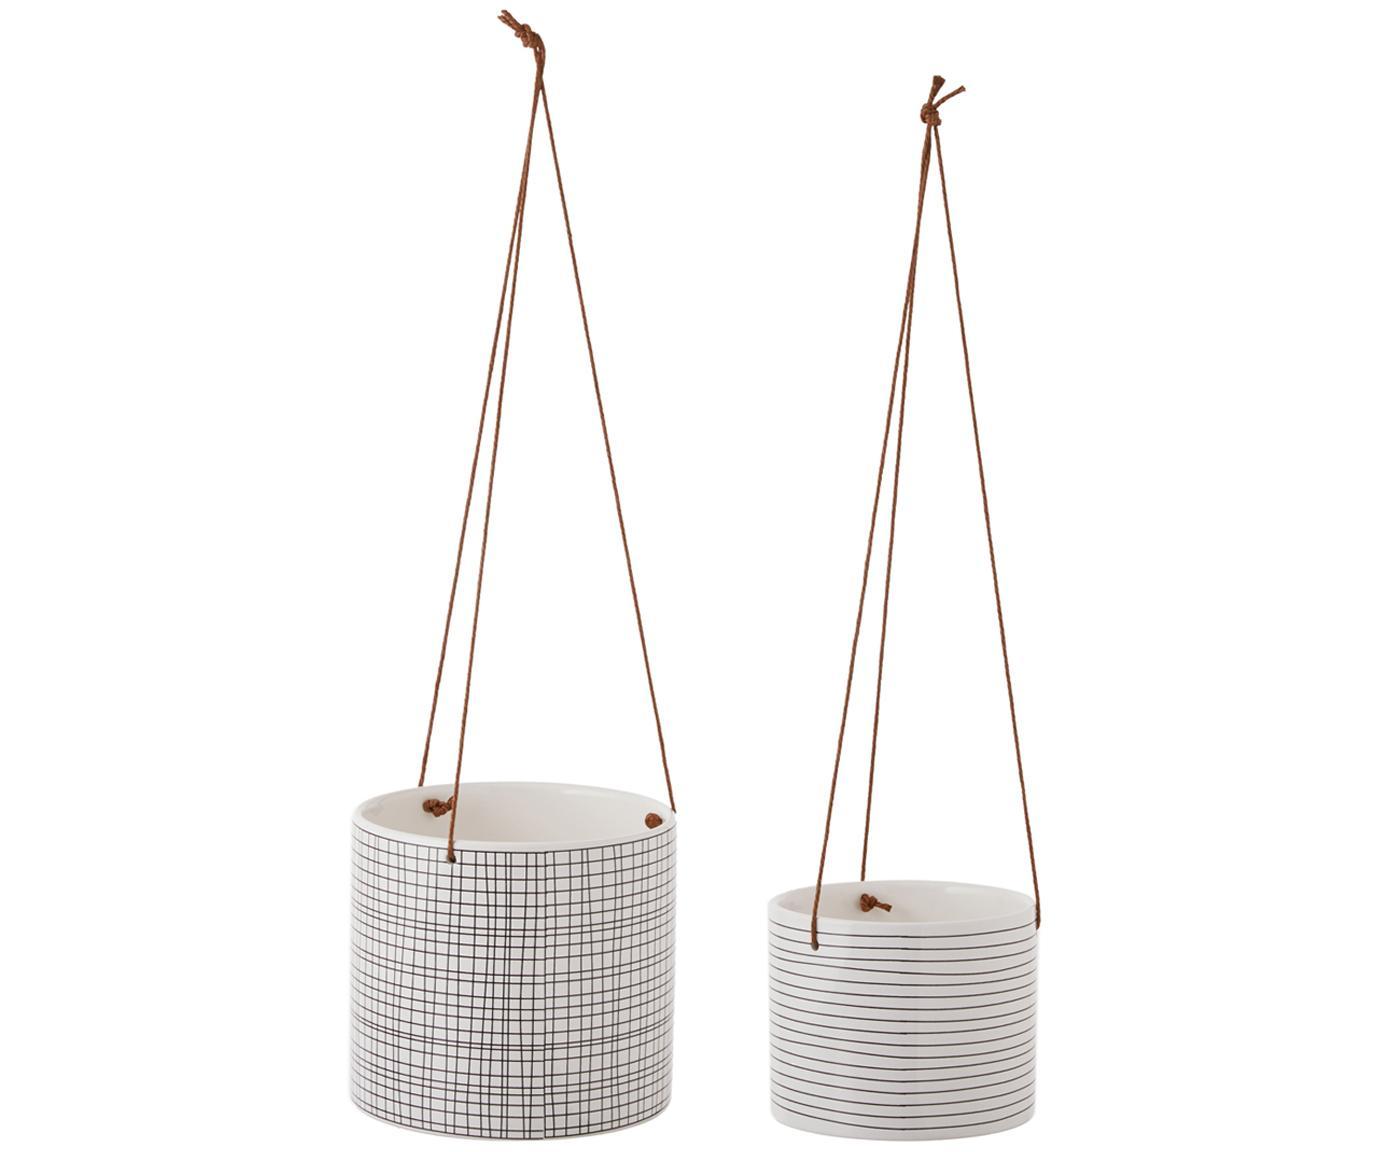 Set de cestas colgantes Sannie, 2pzas., Cesta: piedra dolomita, Negro, blanco, Tamaños diferentes